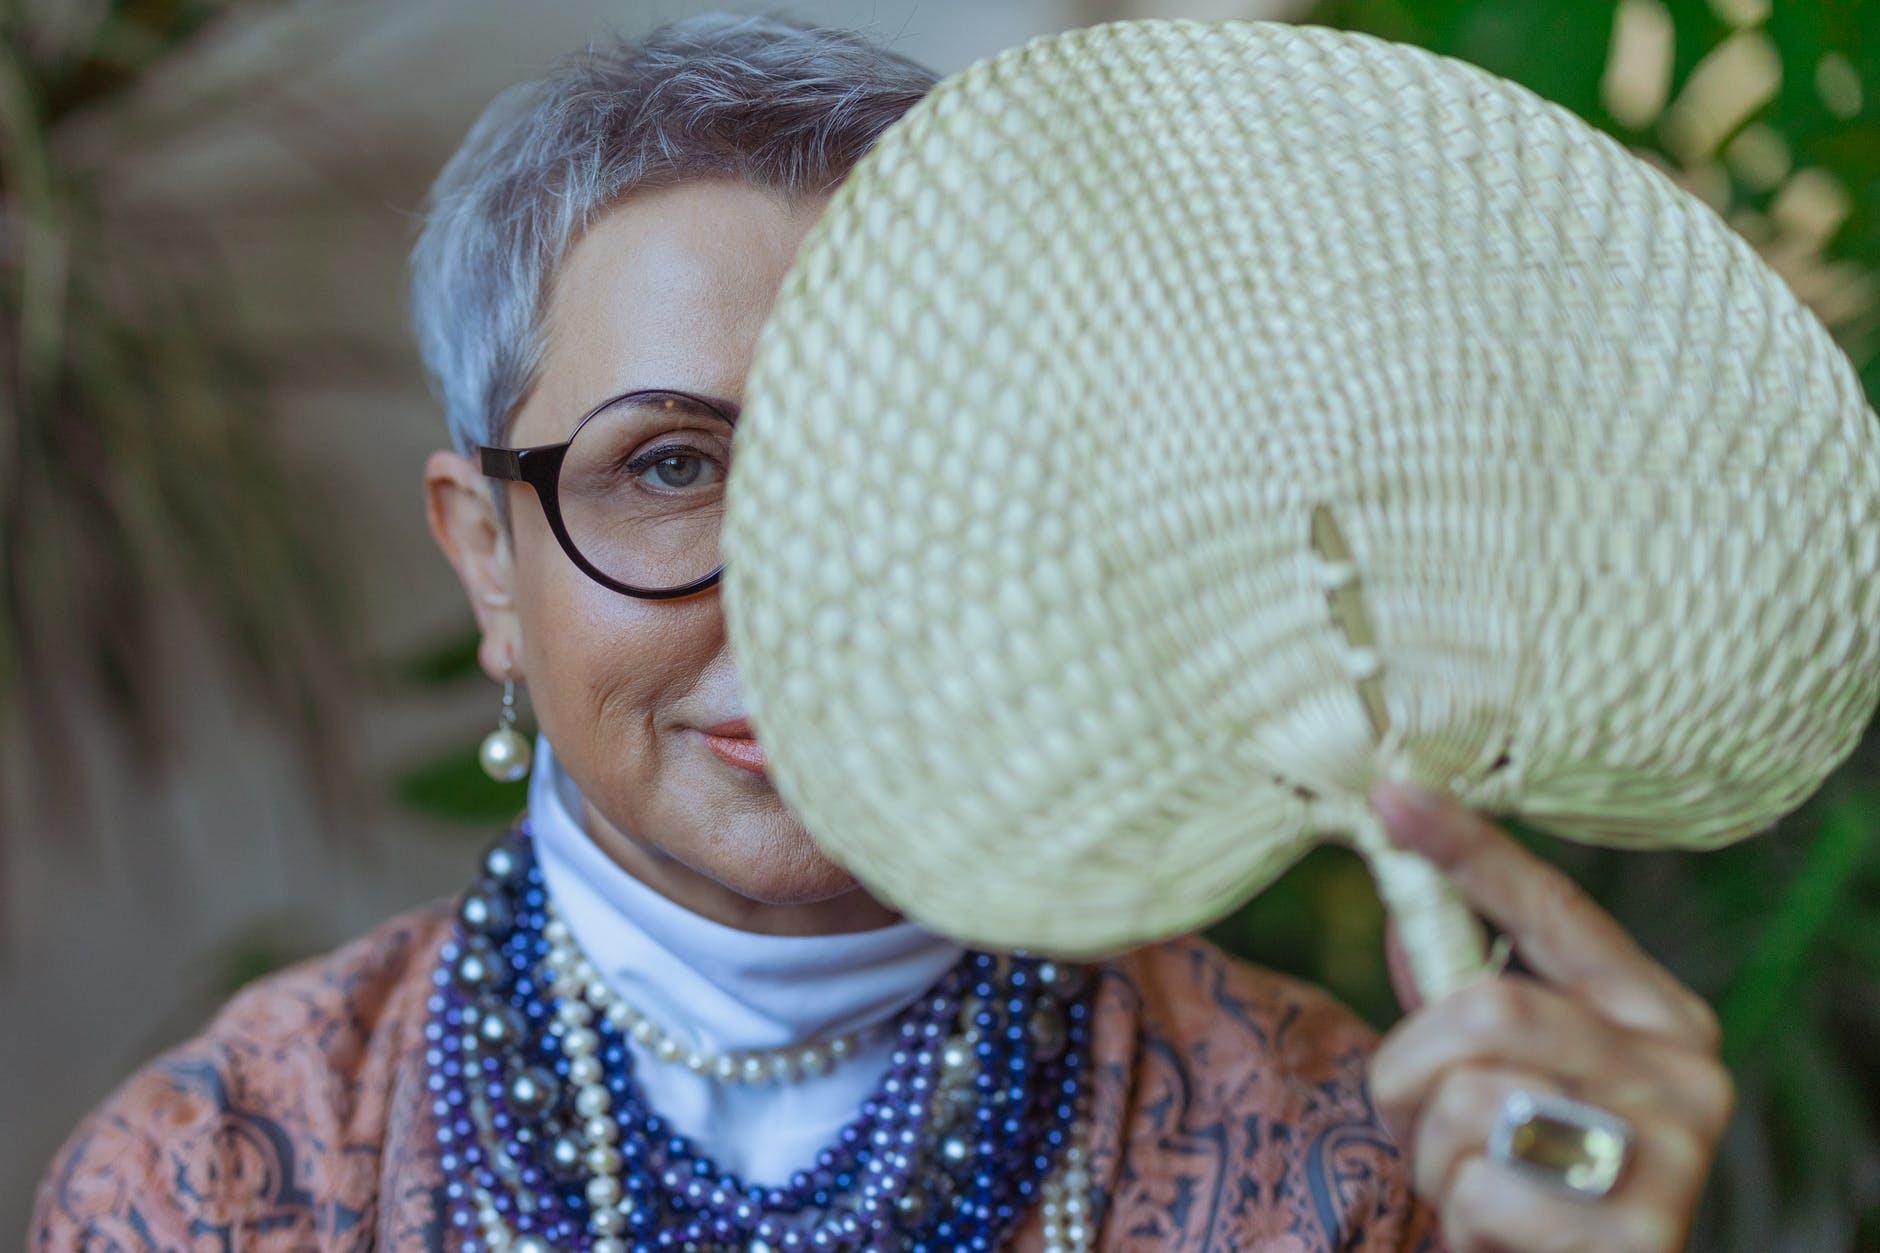 photo of woman holding a fan